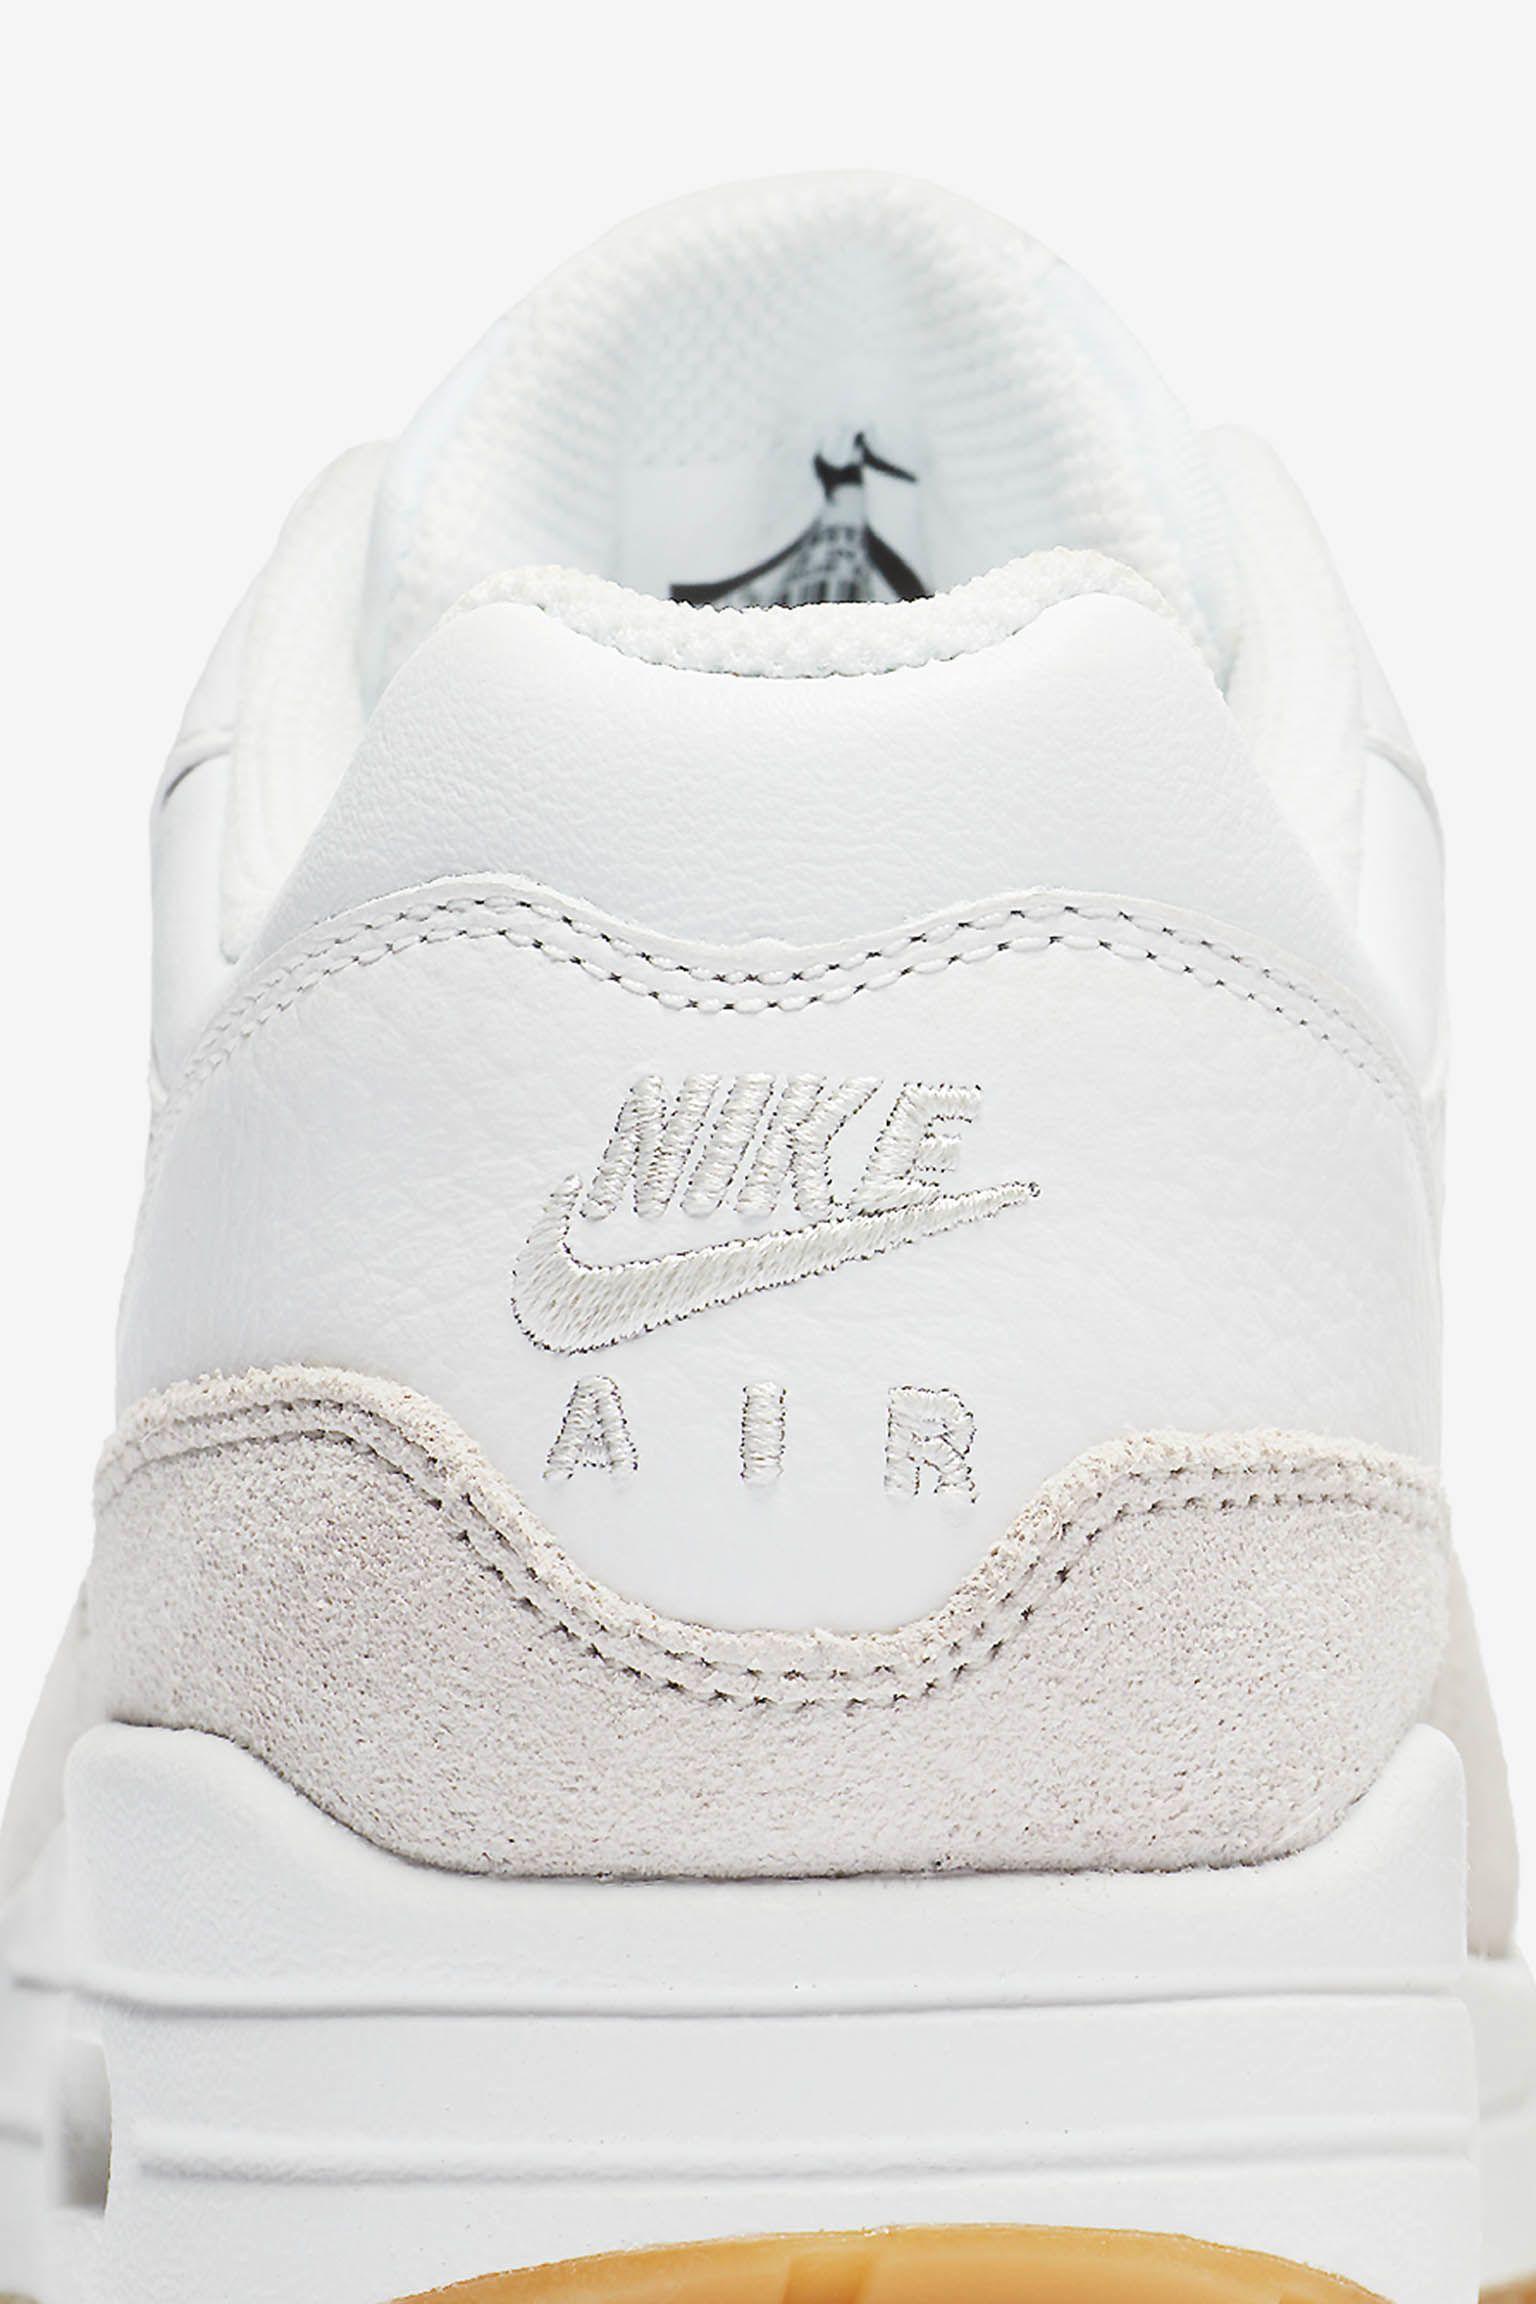 Date de sortie de la Nike Air Max 1 Premium « Summit White & ...